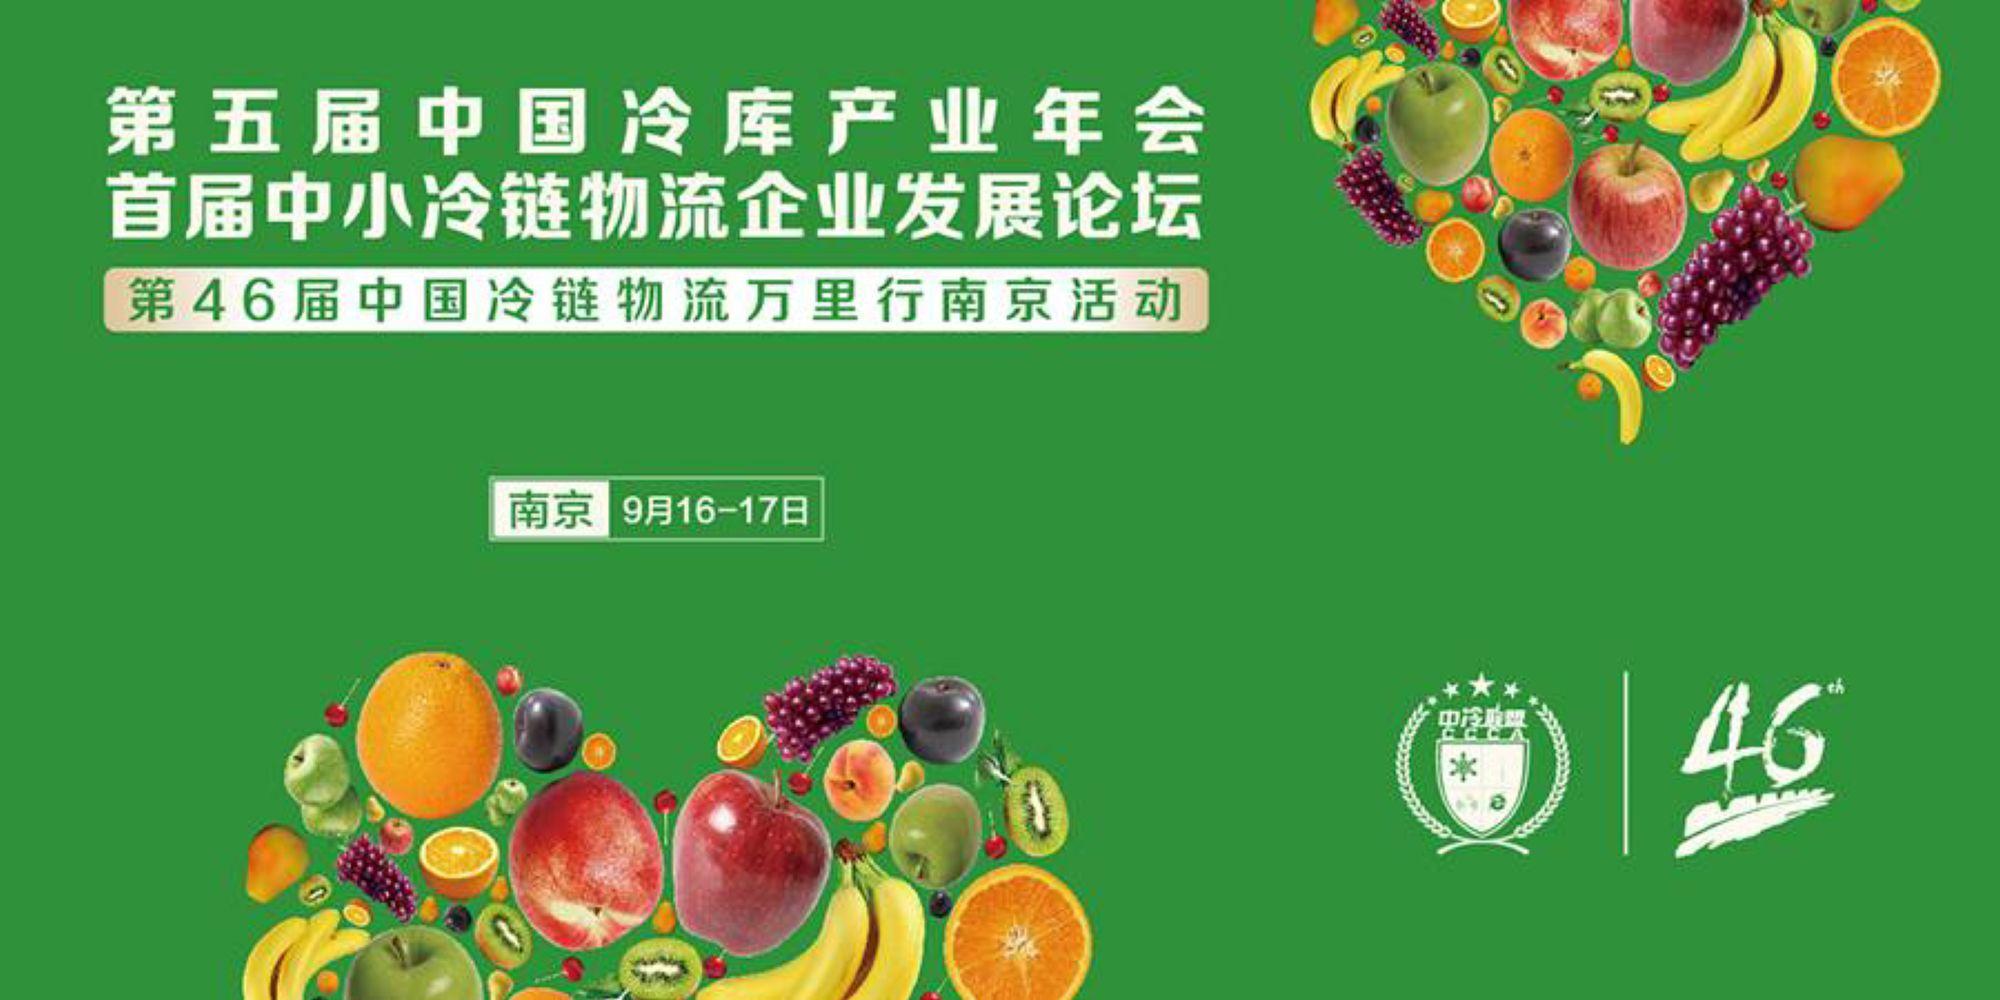 CN_20200916_Food_tradeshow_00.jpg